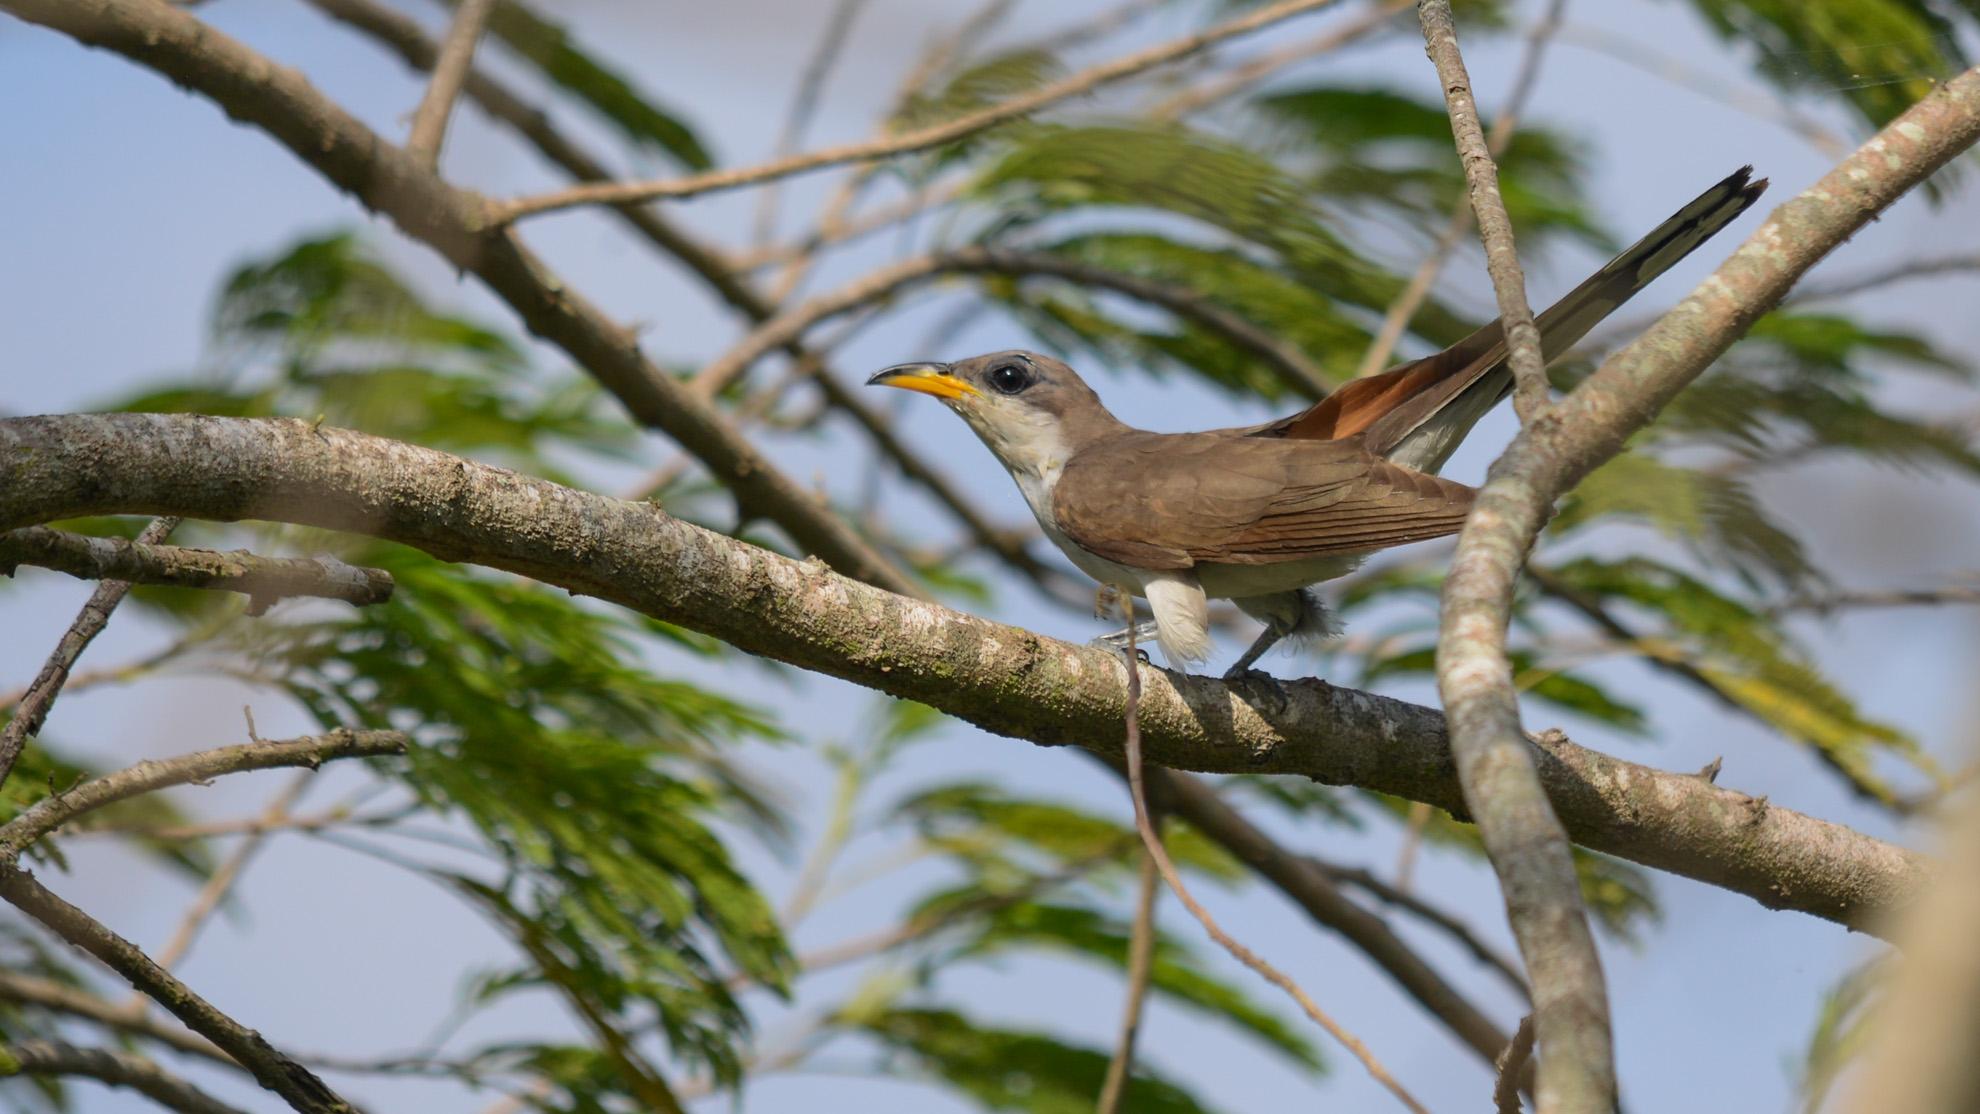 FileYellow Billed Cuckoo Coccyzus Americanus 02